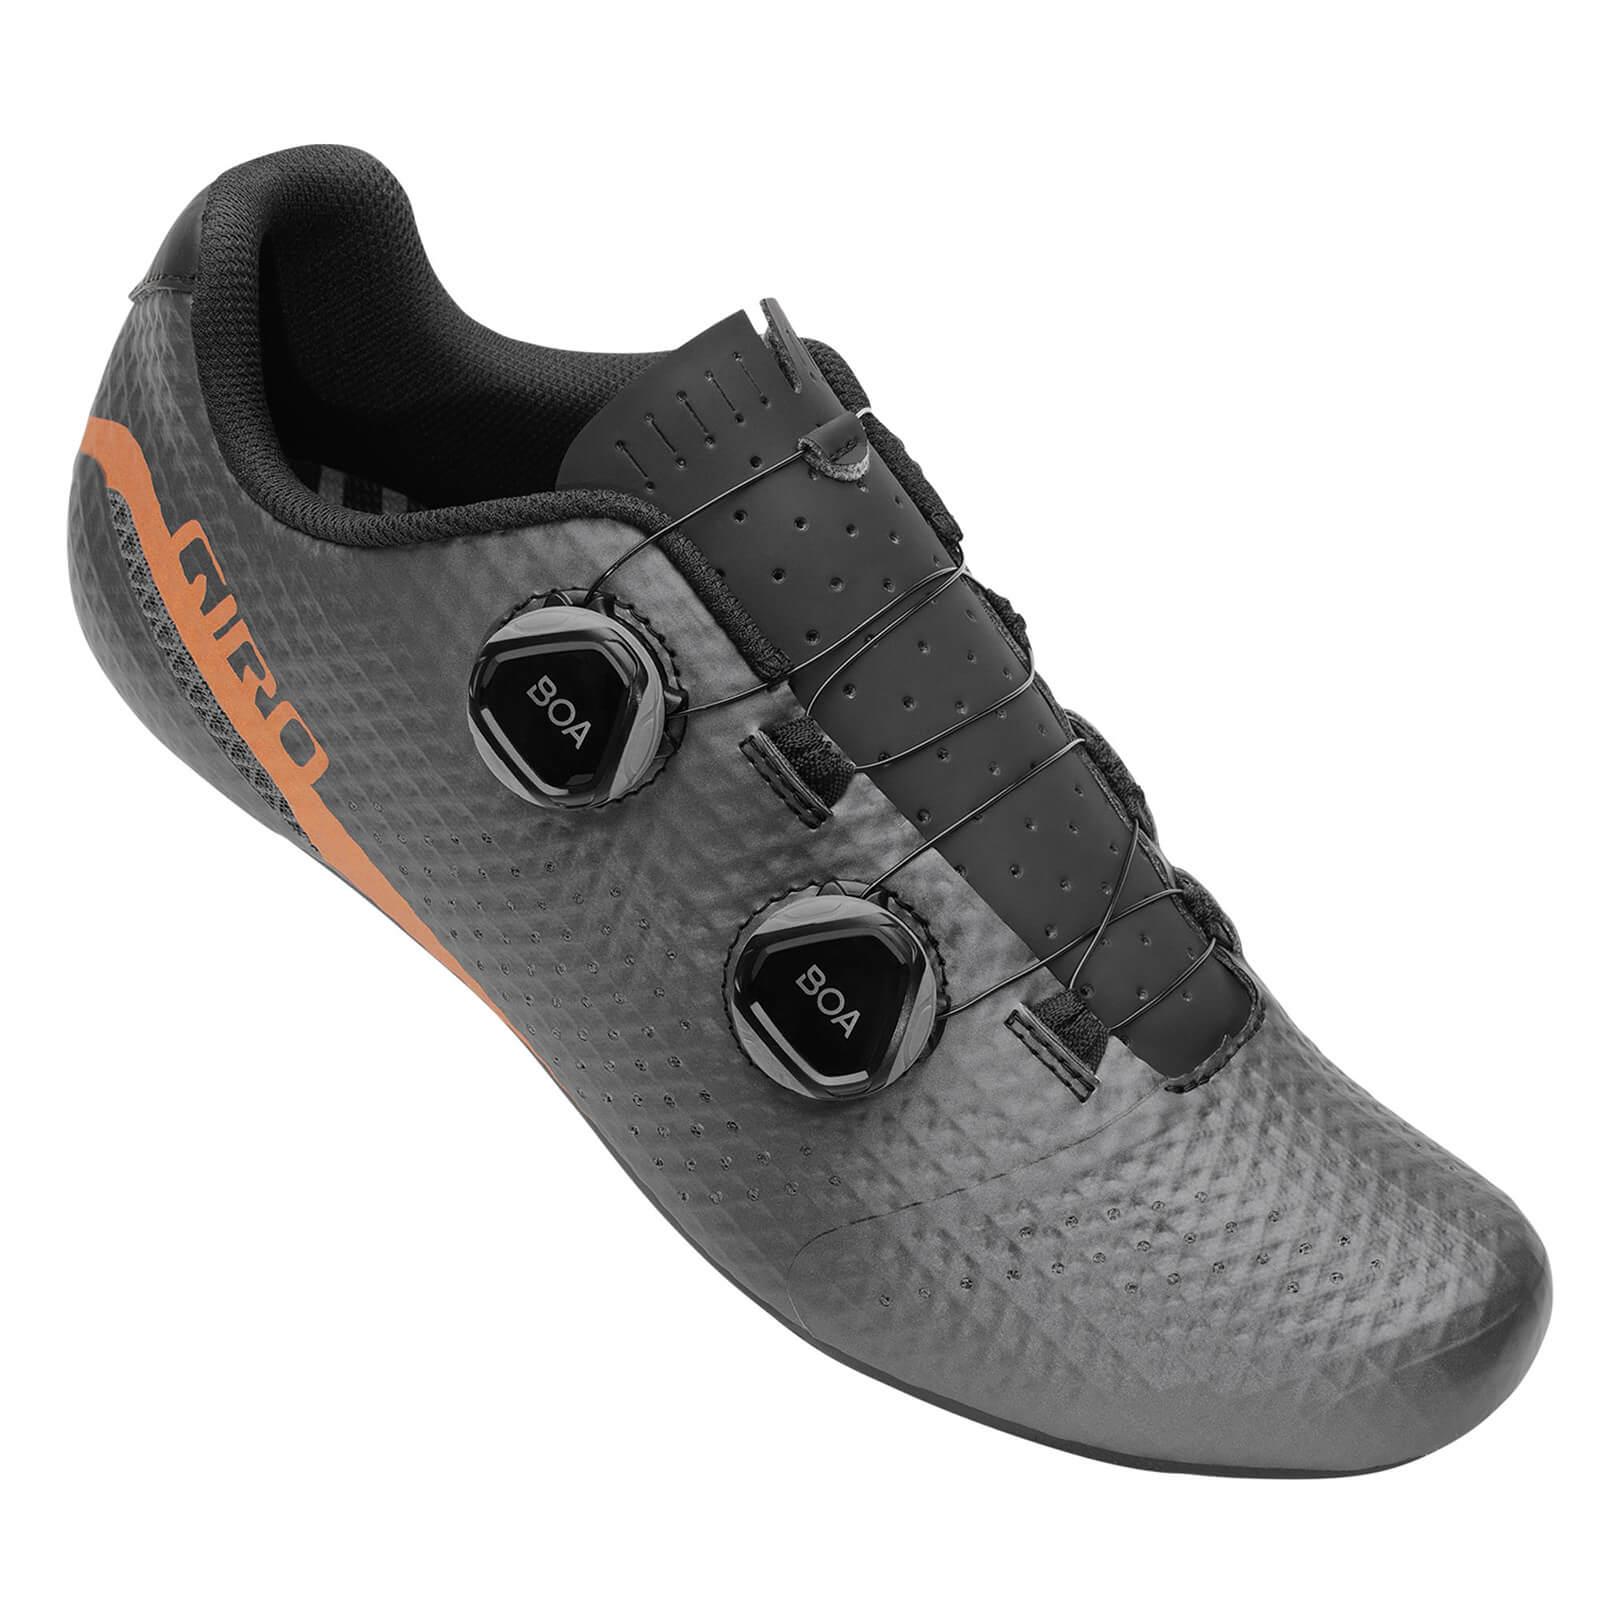 Giro Regime Road Shoe - EU 47 - Black/Copper